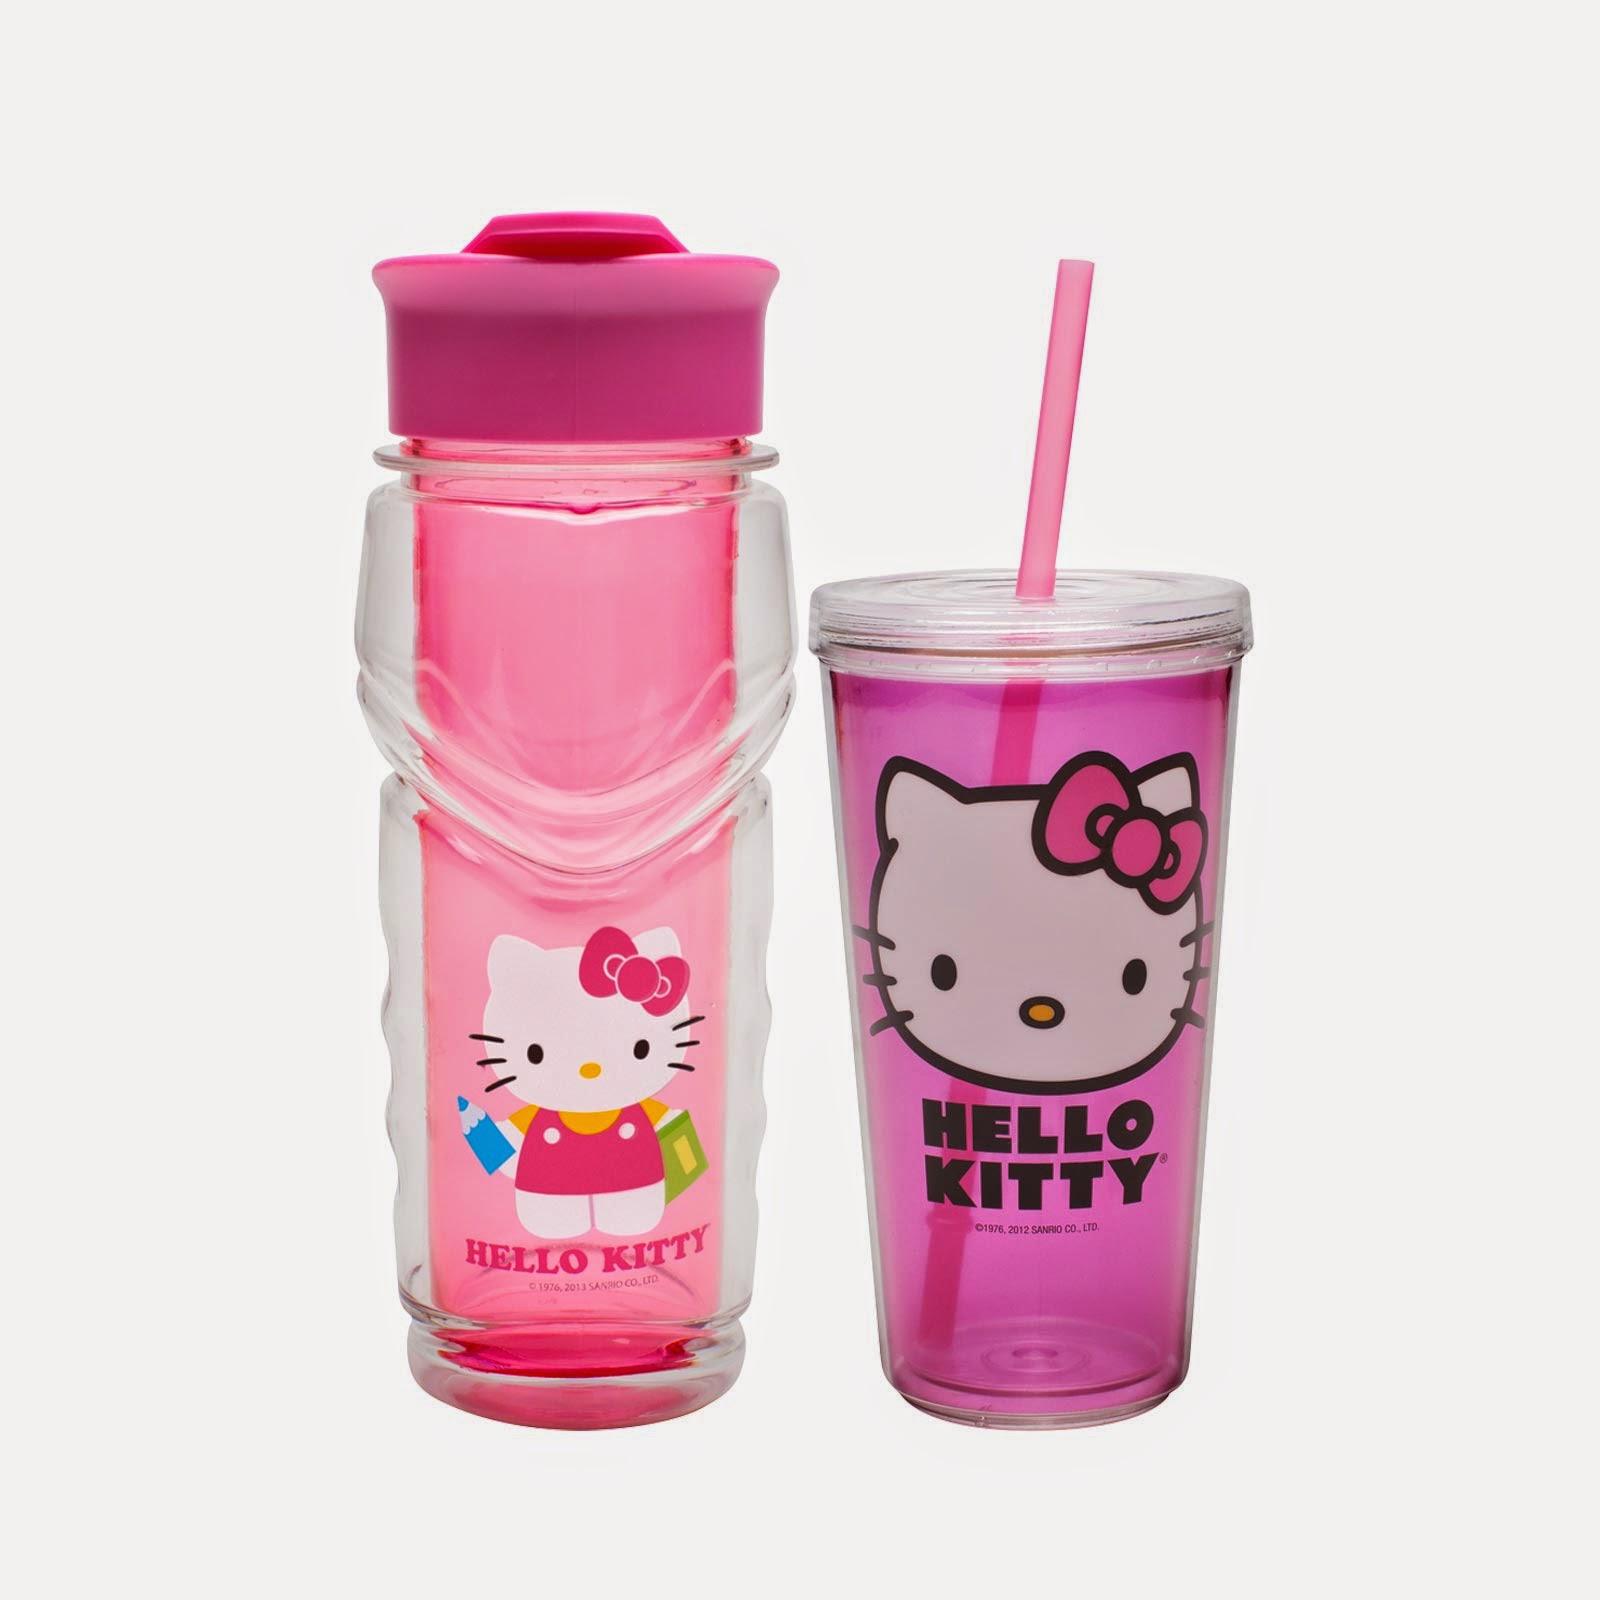 Gambar botol minum hello kitty untuk anak gratis